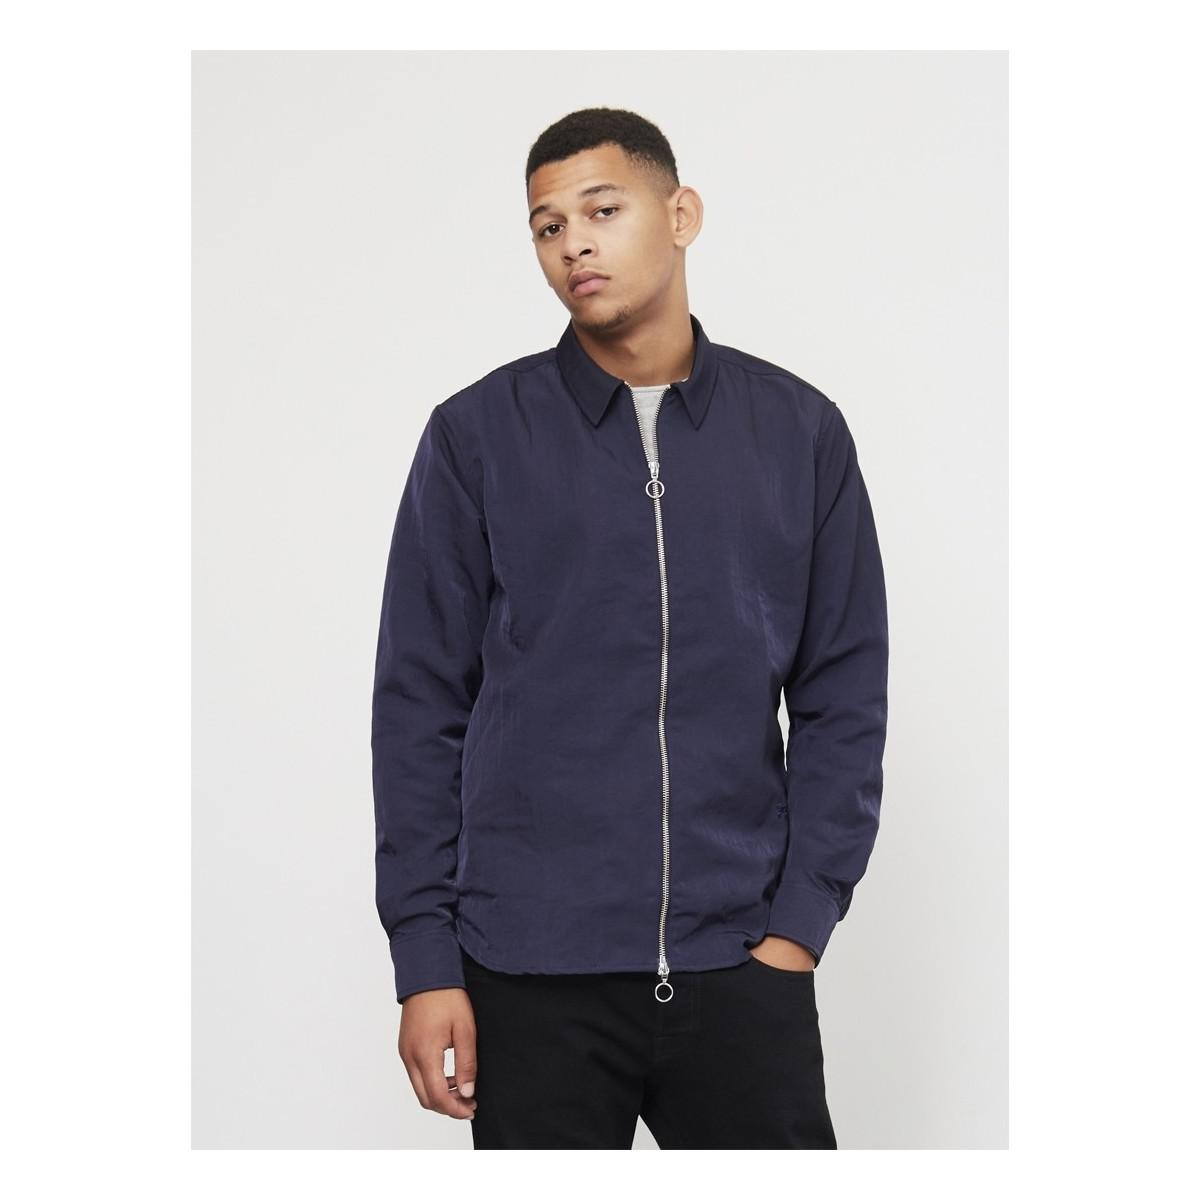 Soulland David Light Zip Jacket Navy Men's Jacket In Blue for Men